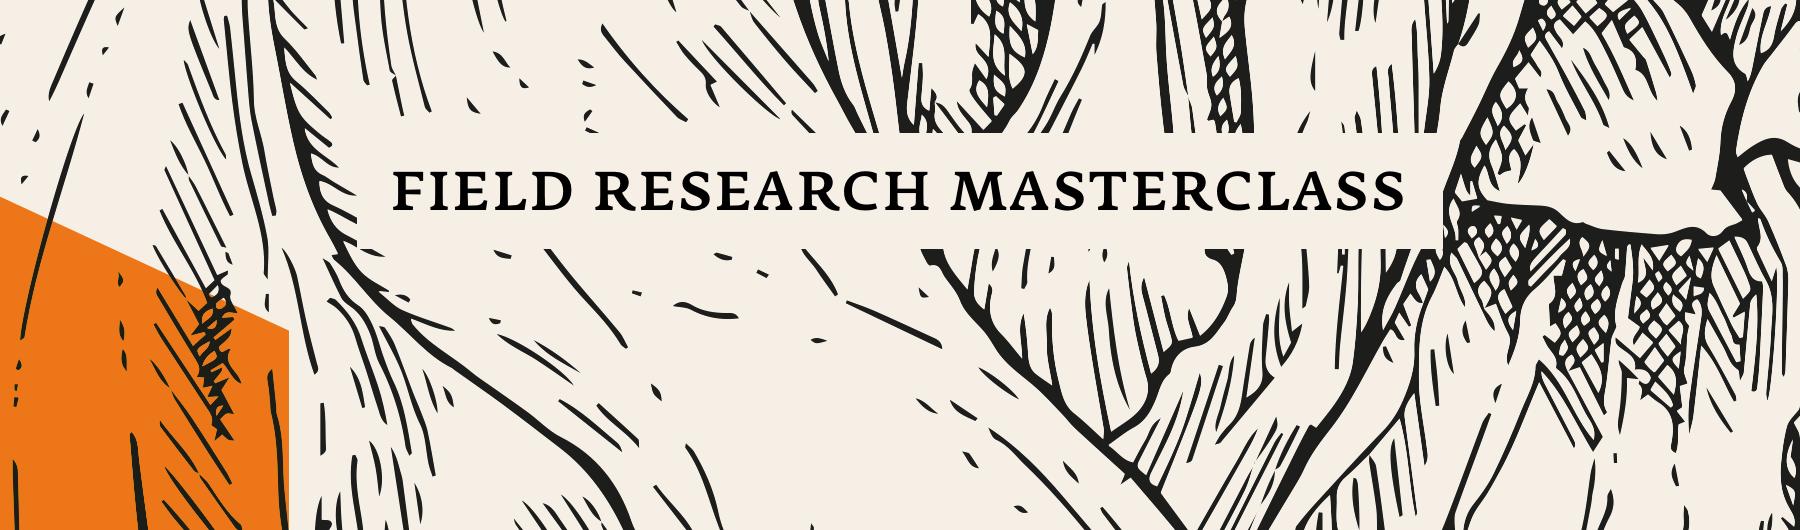 May 15, Field Research Masterclass, Paris